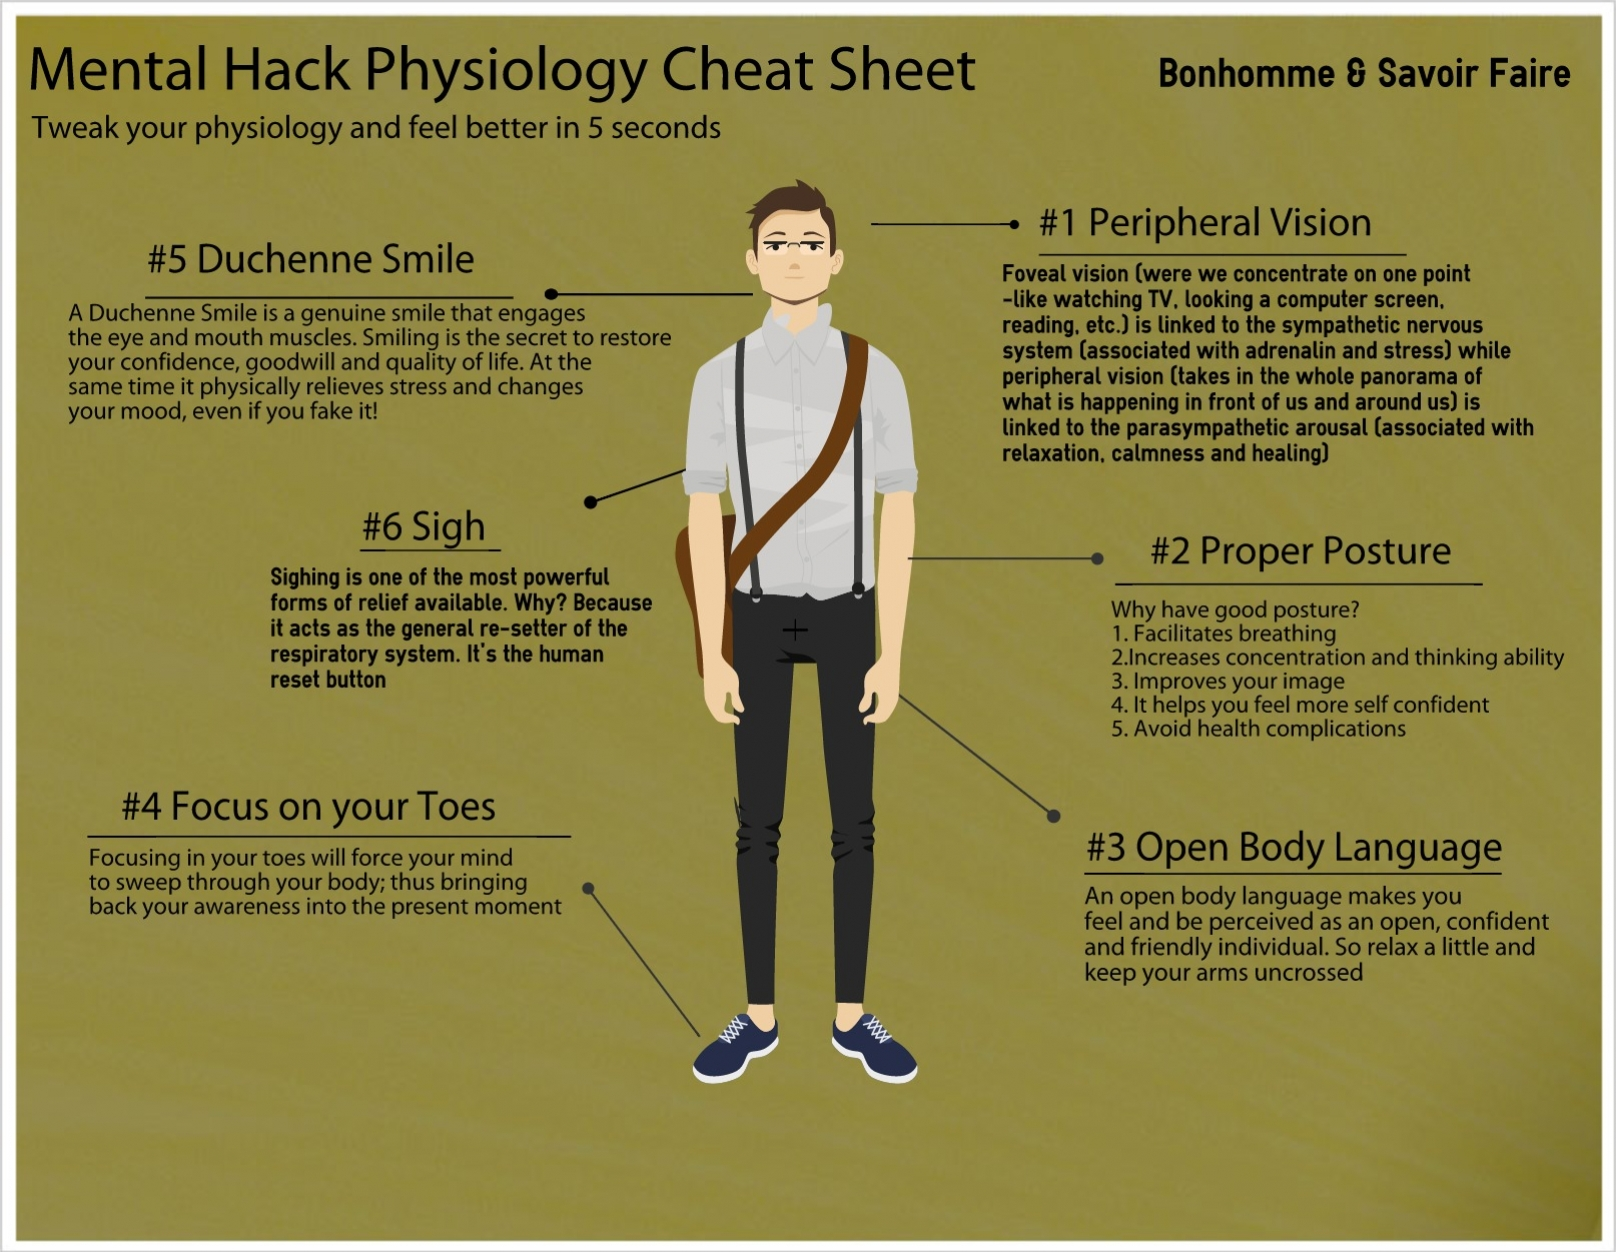 MentalHackPhysiologyCheatSheet